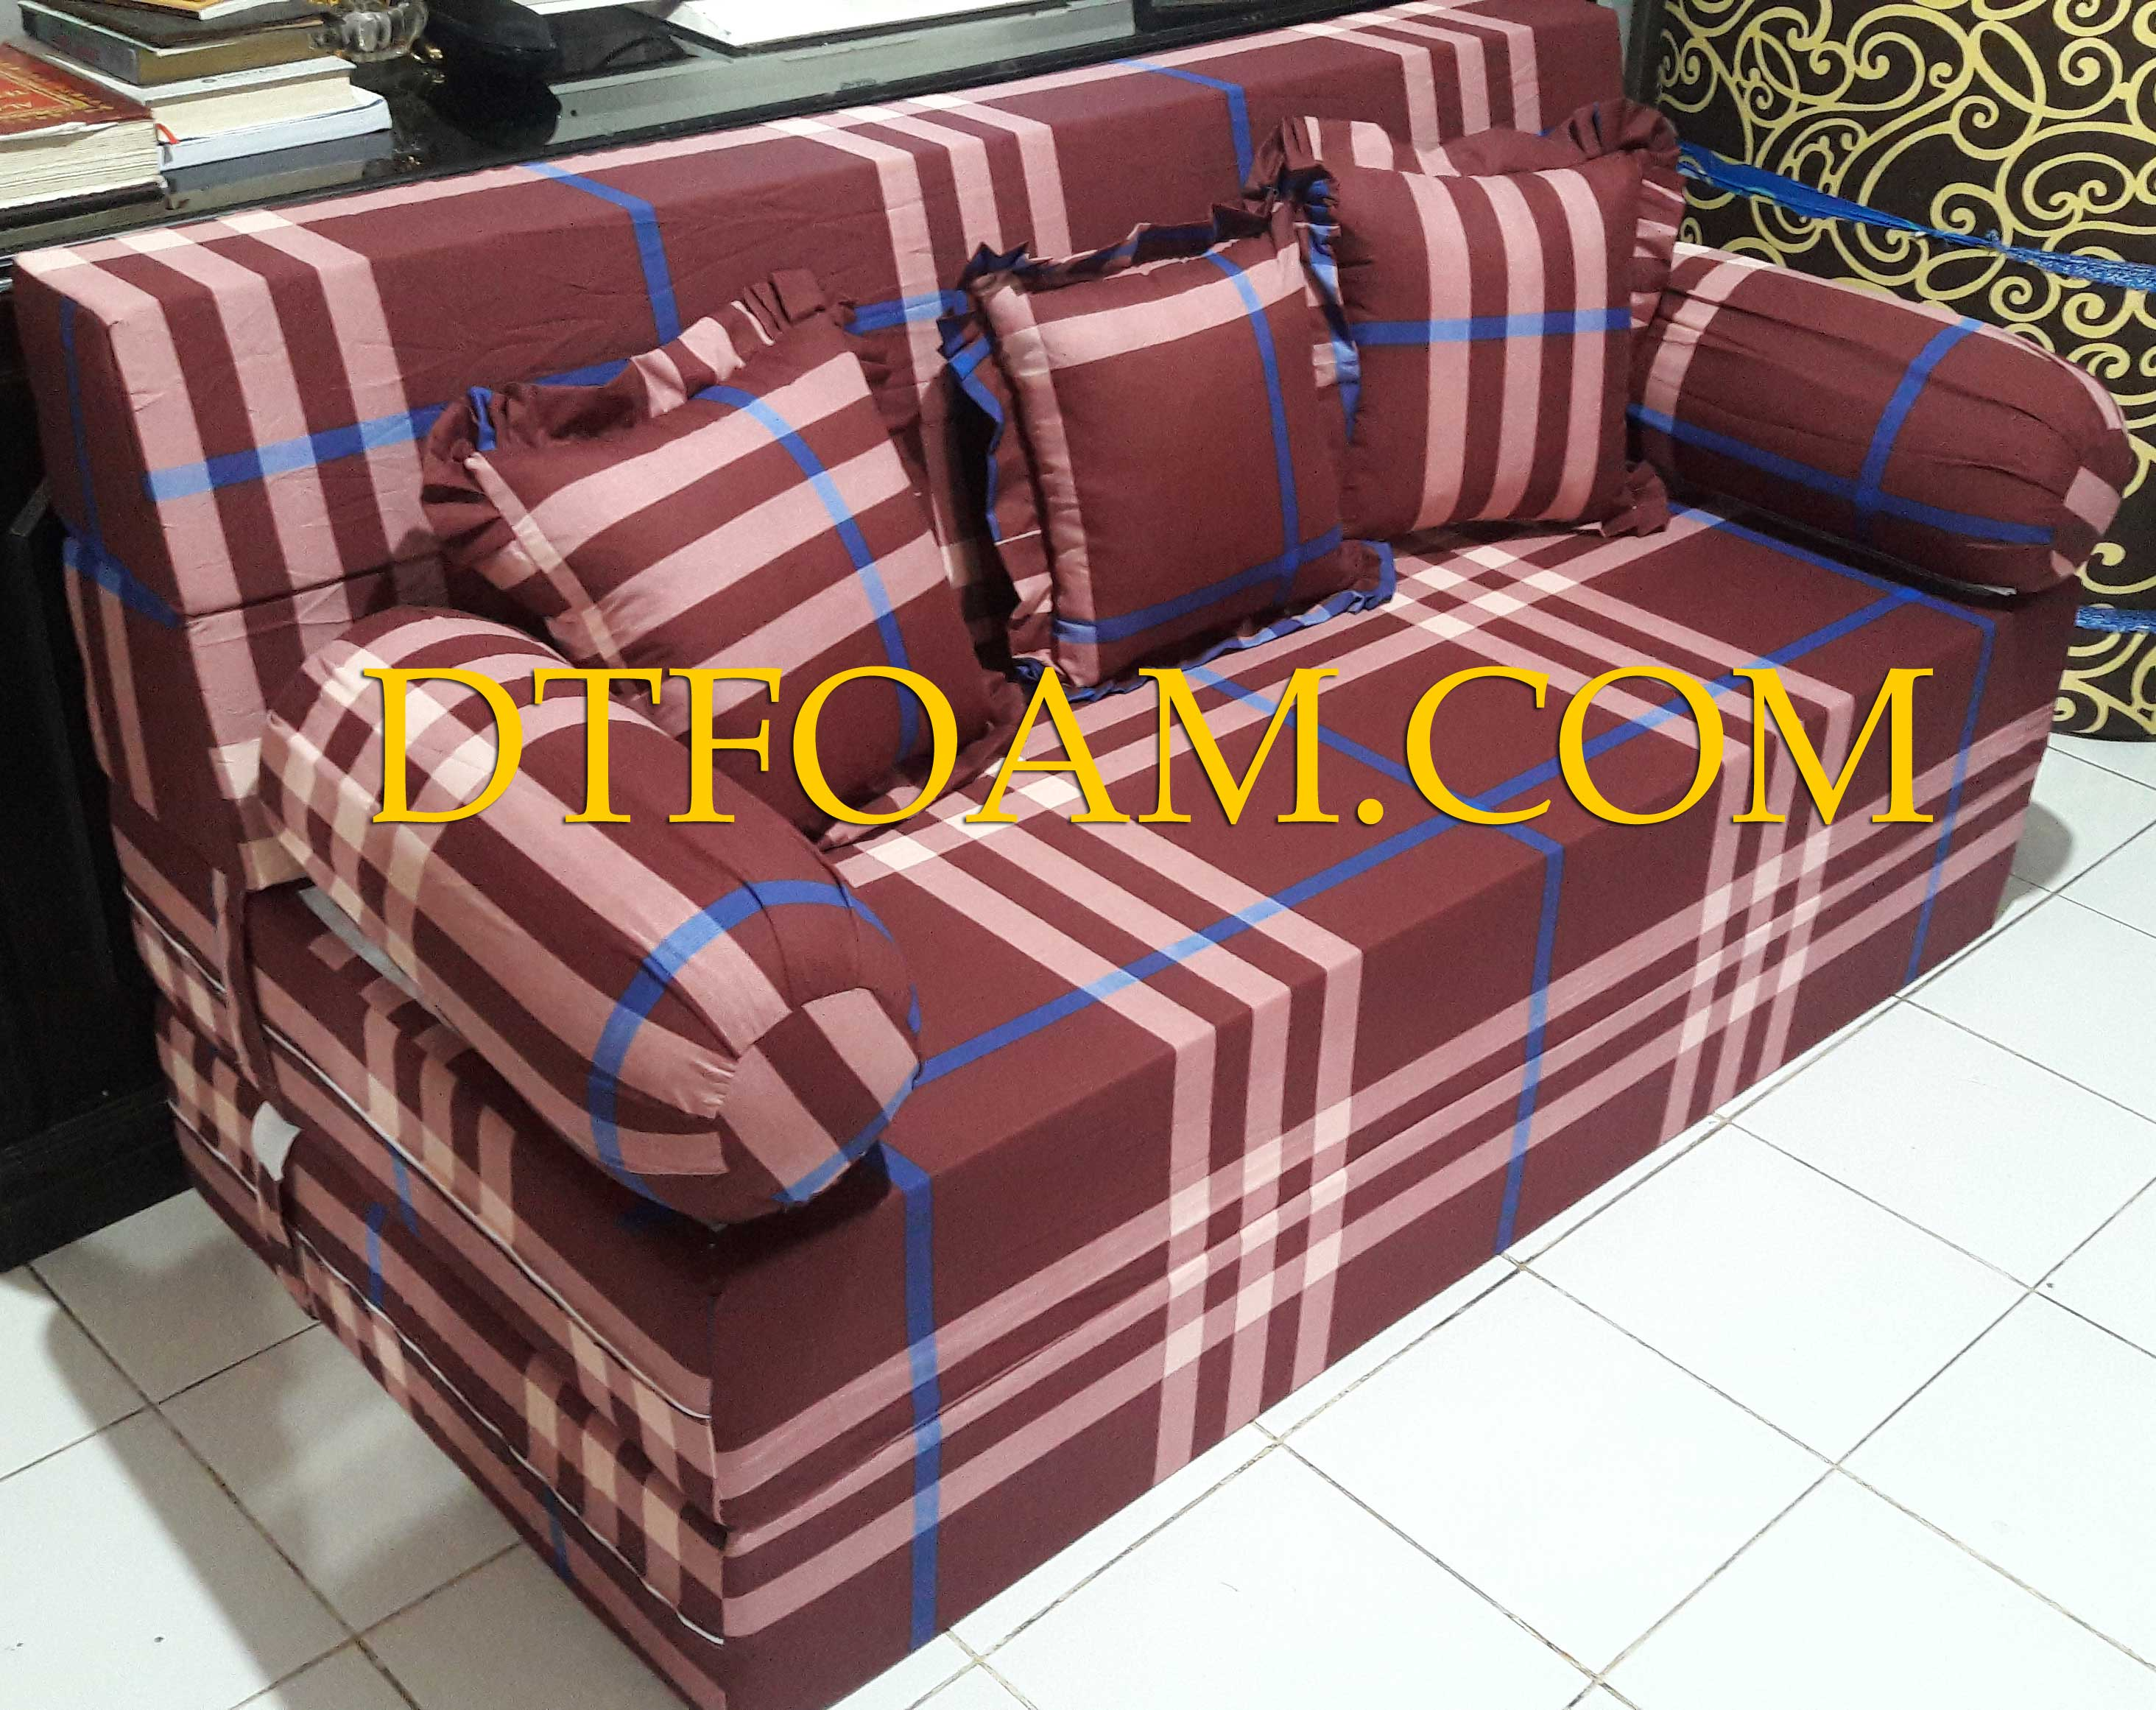 sofa bed kasur busa lipat inoac jakarta slipcovers for chaise lounge murah dtfoam com